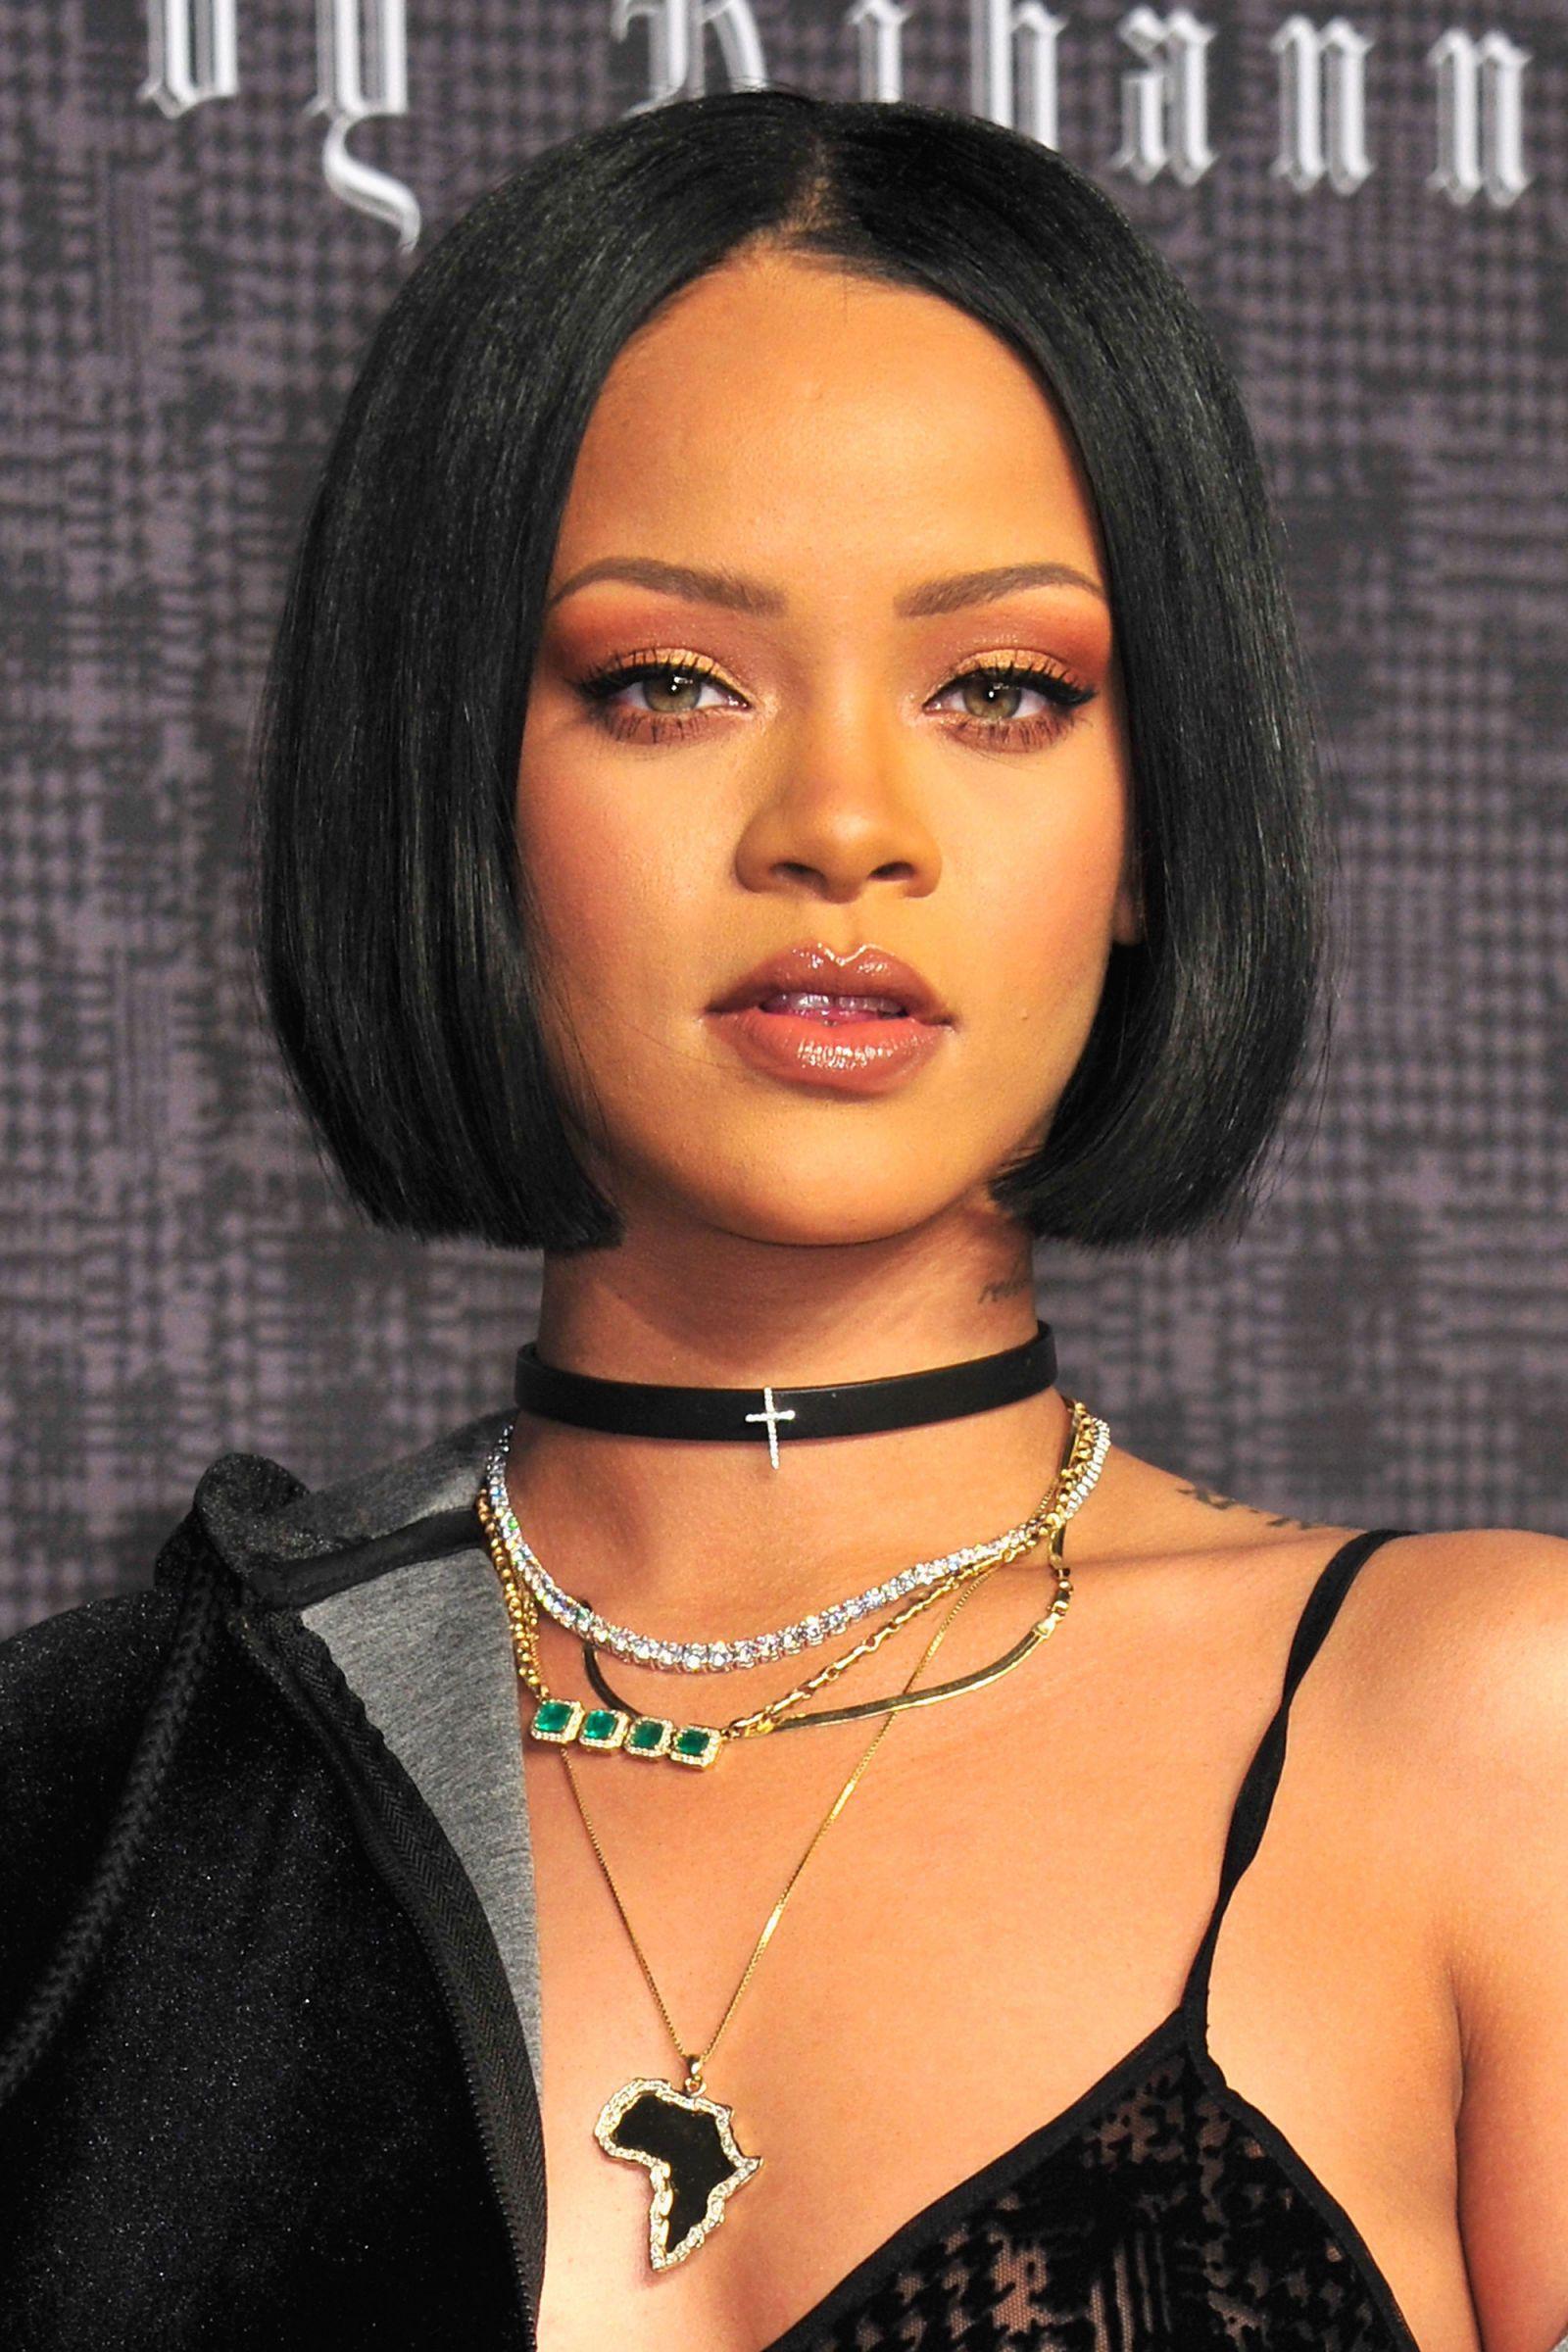 b5c03640e7 Rihanna rocks neon turquoise hair | RiRi | Rihanna hairstyles ...